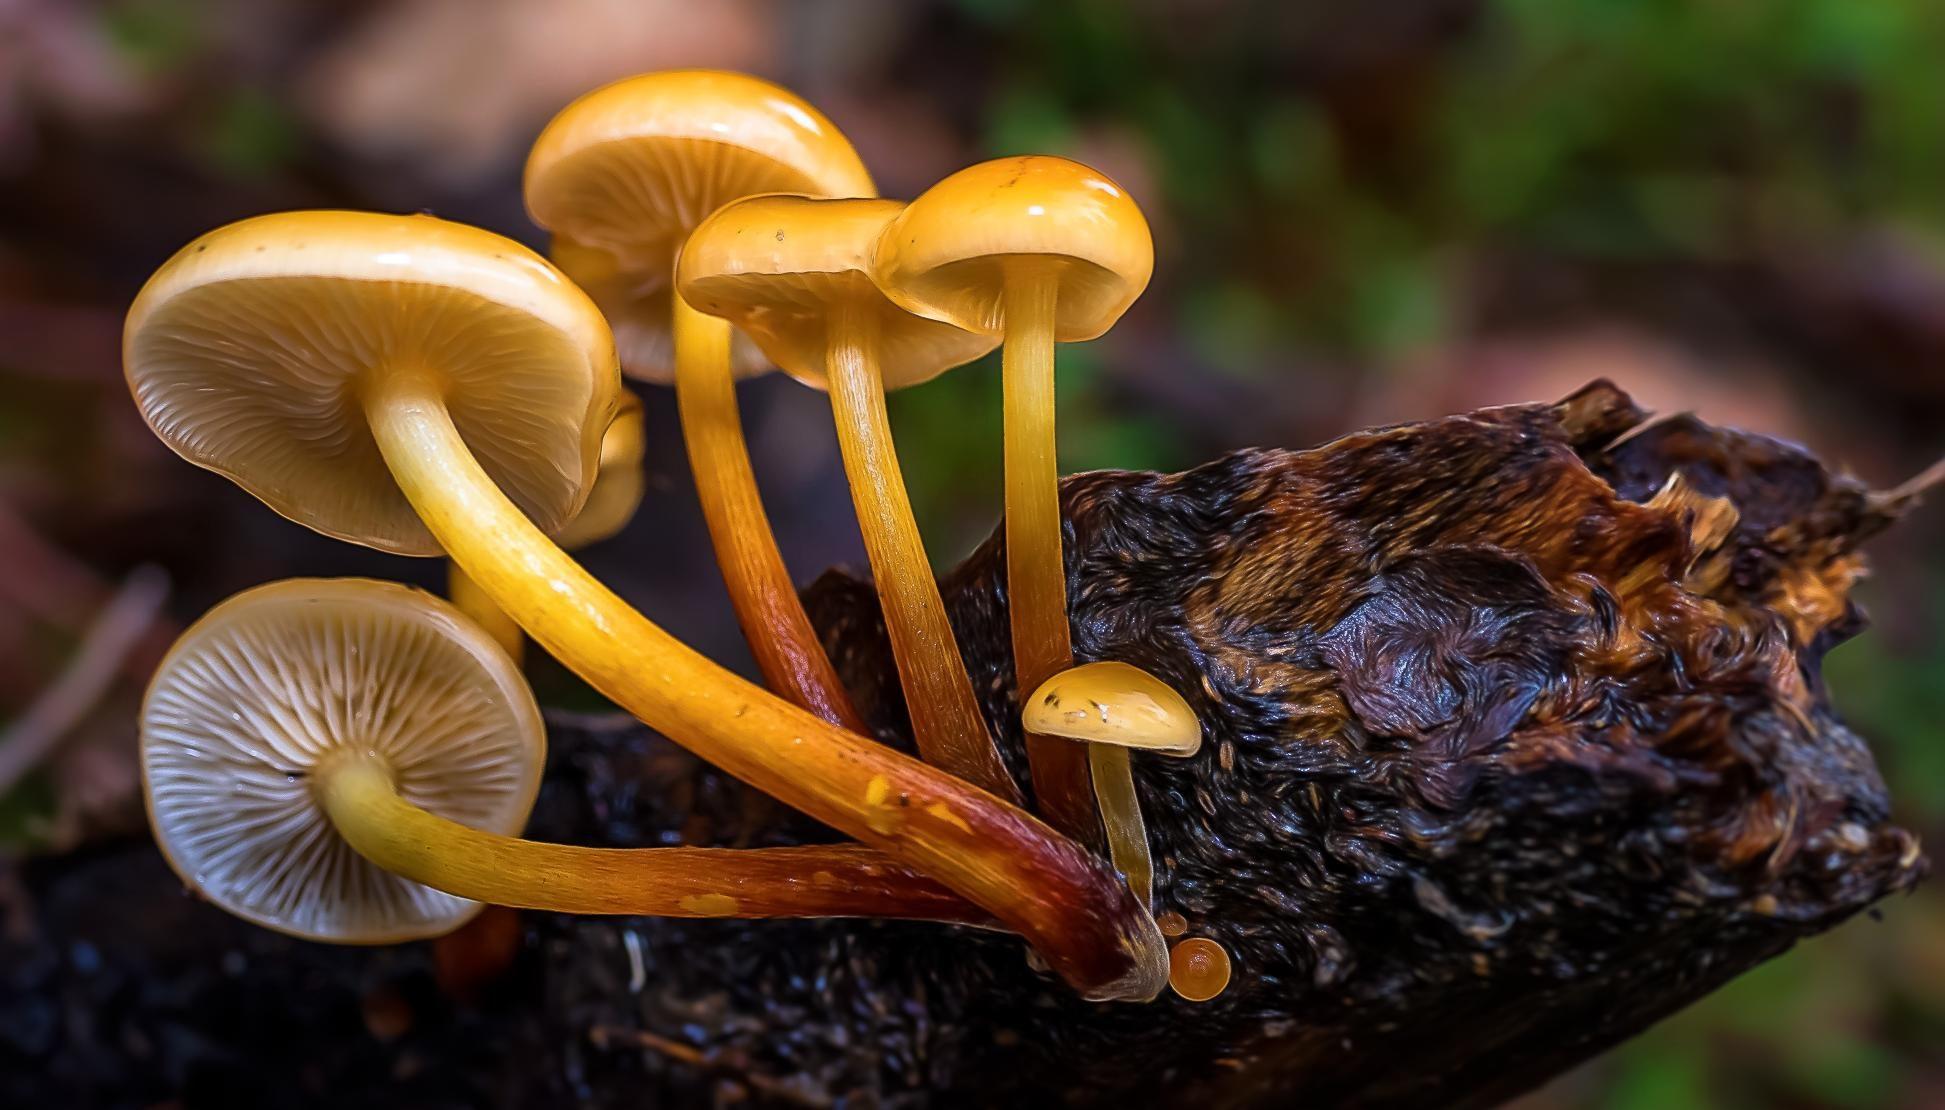 Free Picture Mushroom Fungus Nature Macro Vegetable